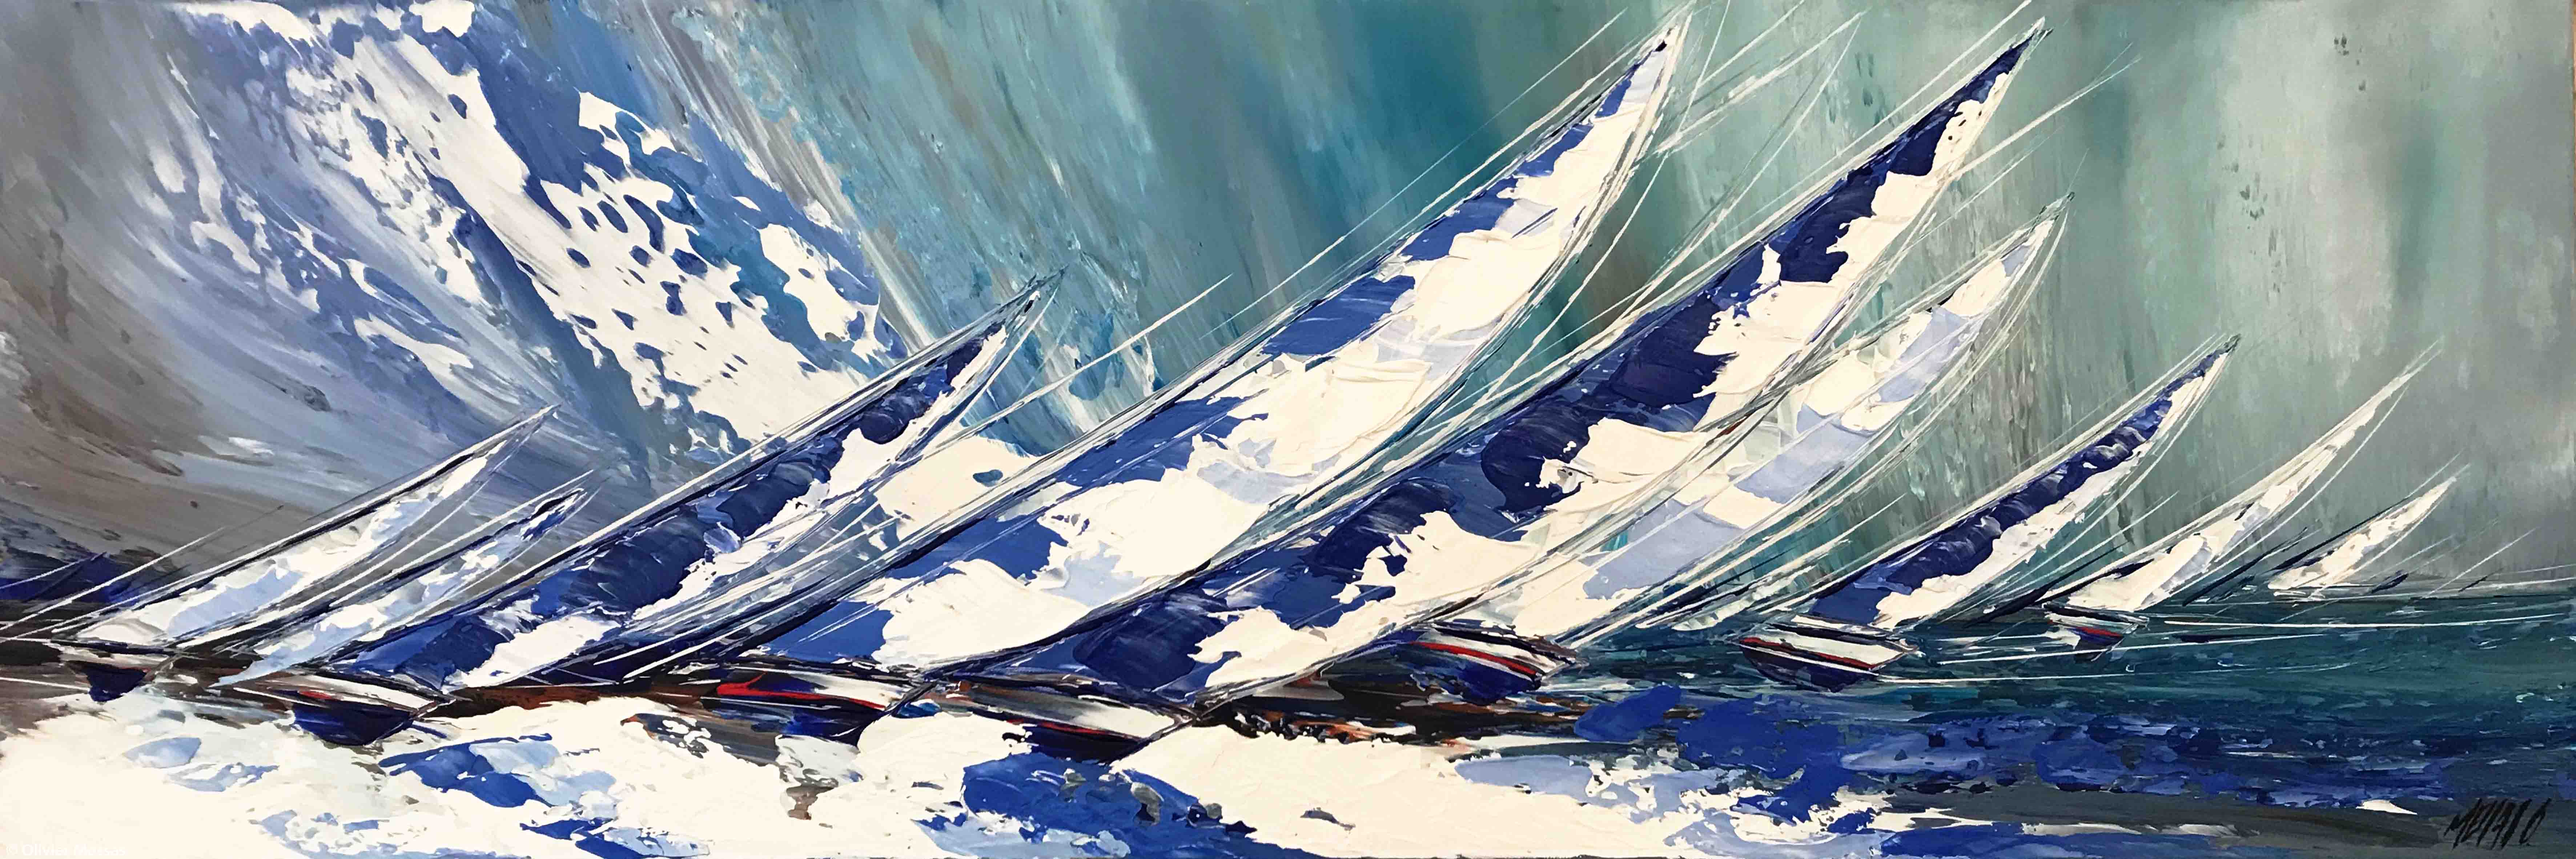 Le grand bleu..., 40x120